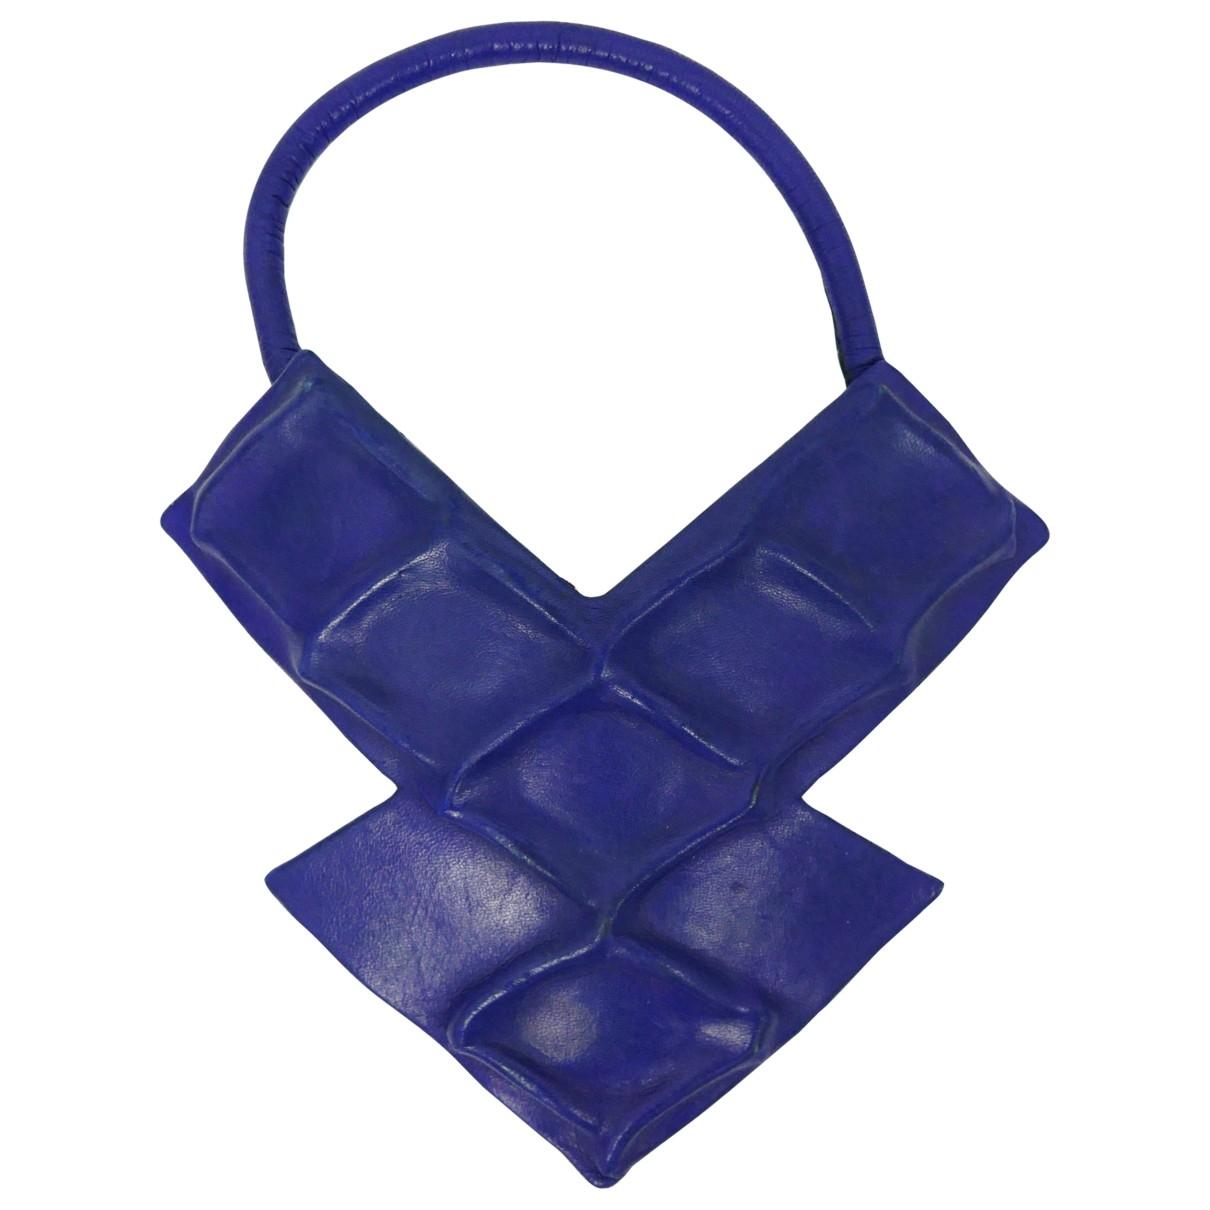 Pierre Cardin \N Kette in  Blau Leder